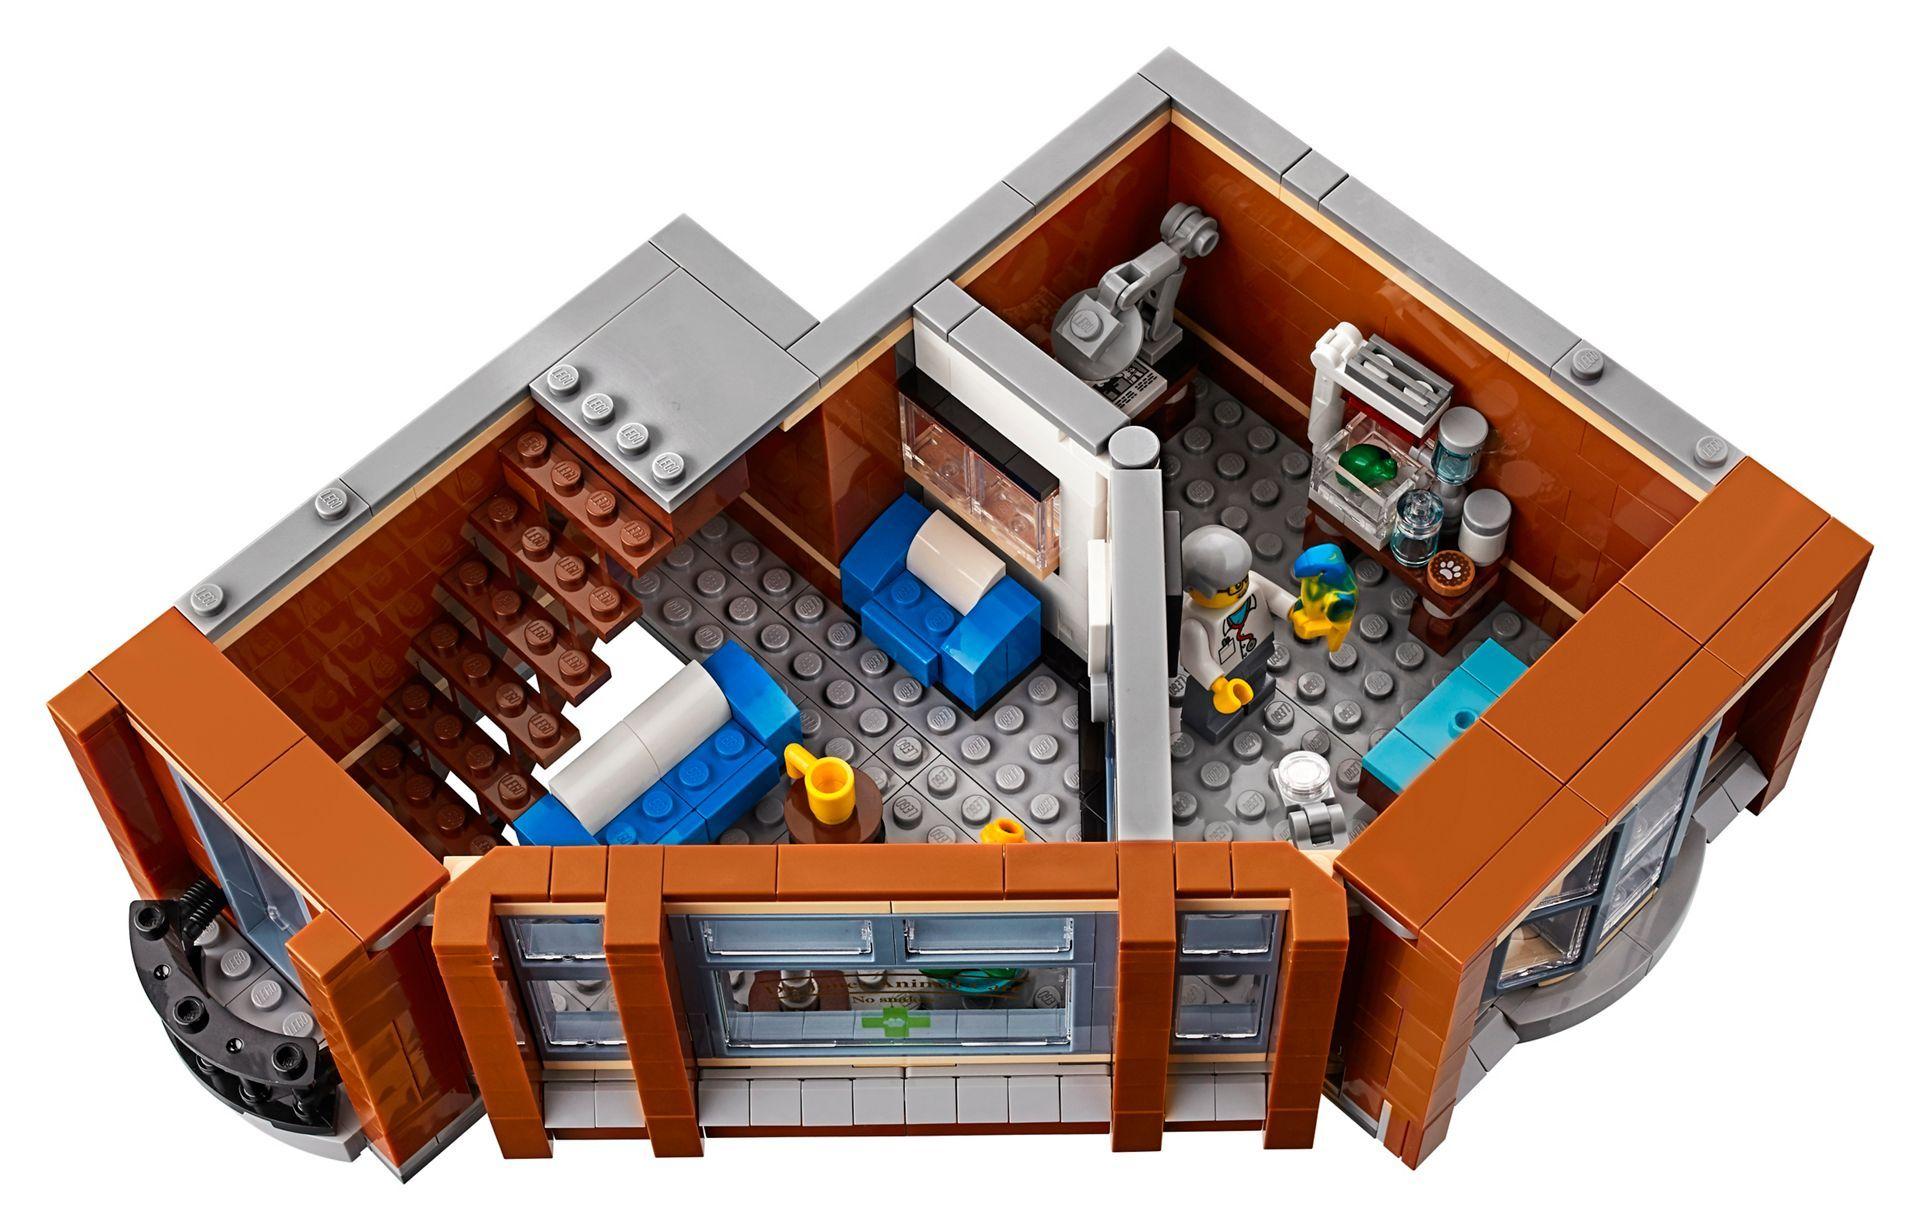 lego creator expert 10264 eckgarage ab 1 januar 2019 verf gbar brickzeit. Black Bedroom Furniture Sets. Home Design Ideas